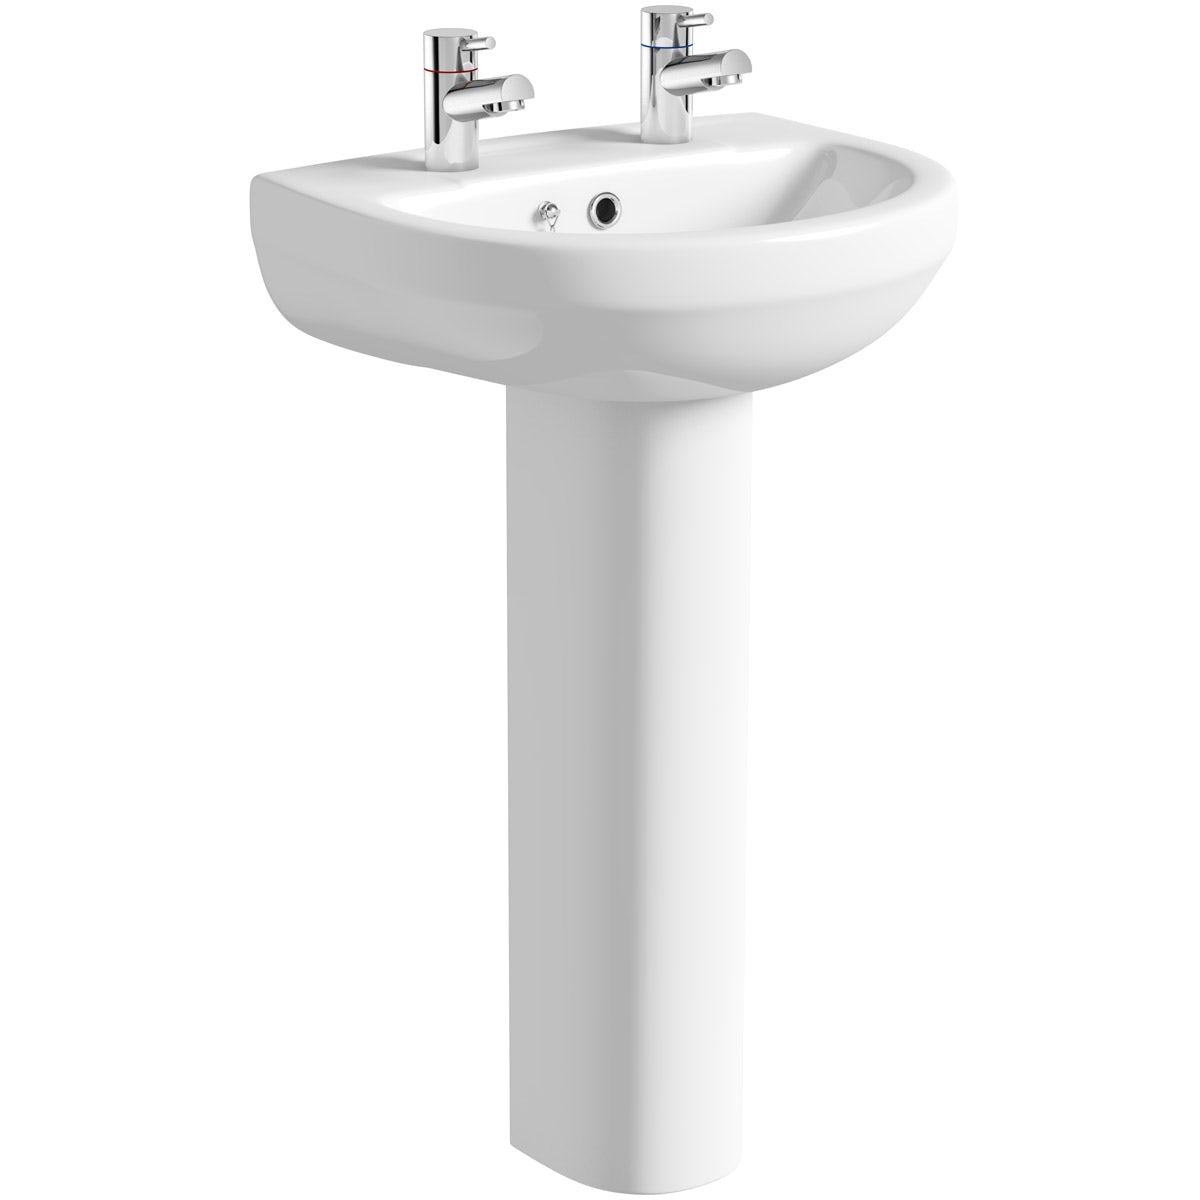 Orchard Wharfe 2 tap hole full pedestal basin